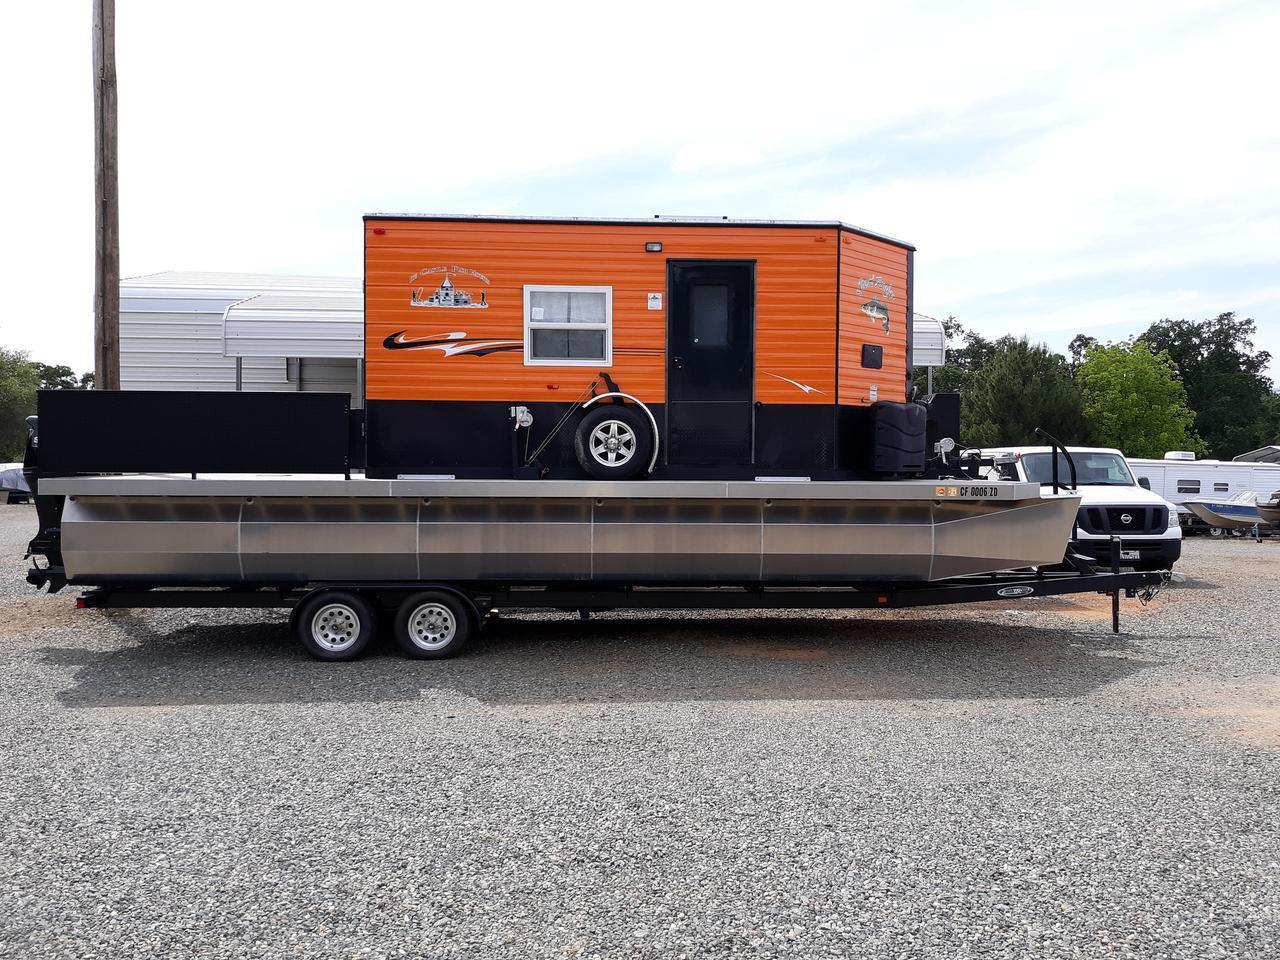 The Heidi-Ho is based on a 30 ft (9.1 m) pontoon boat